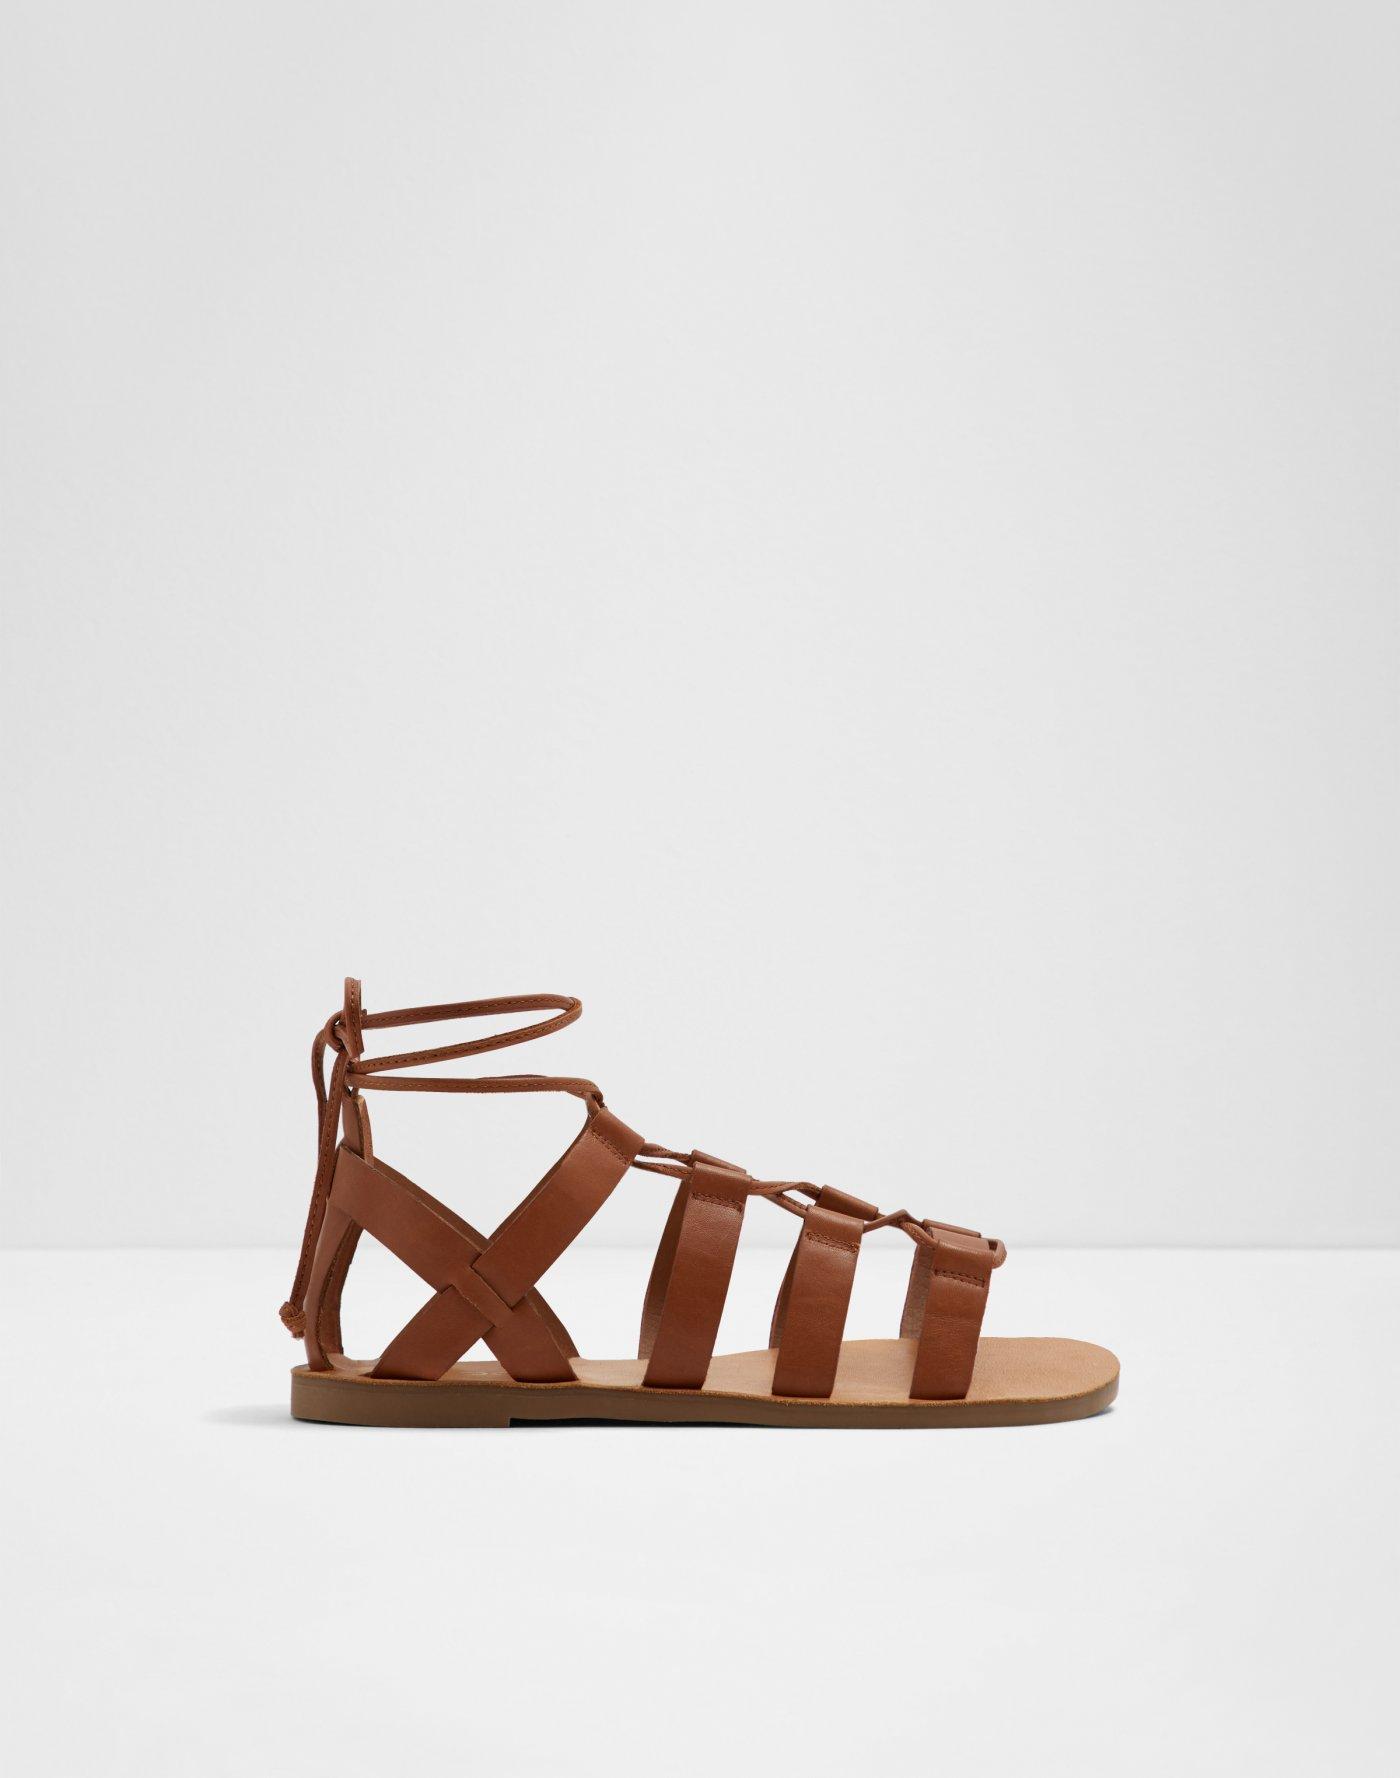 7419d1d9650b Footwear